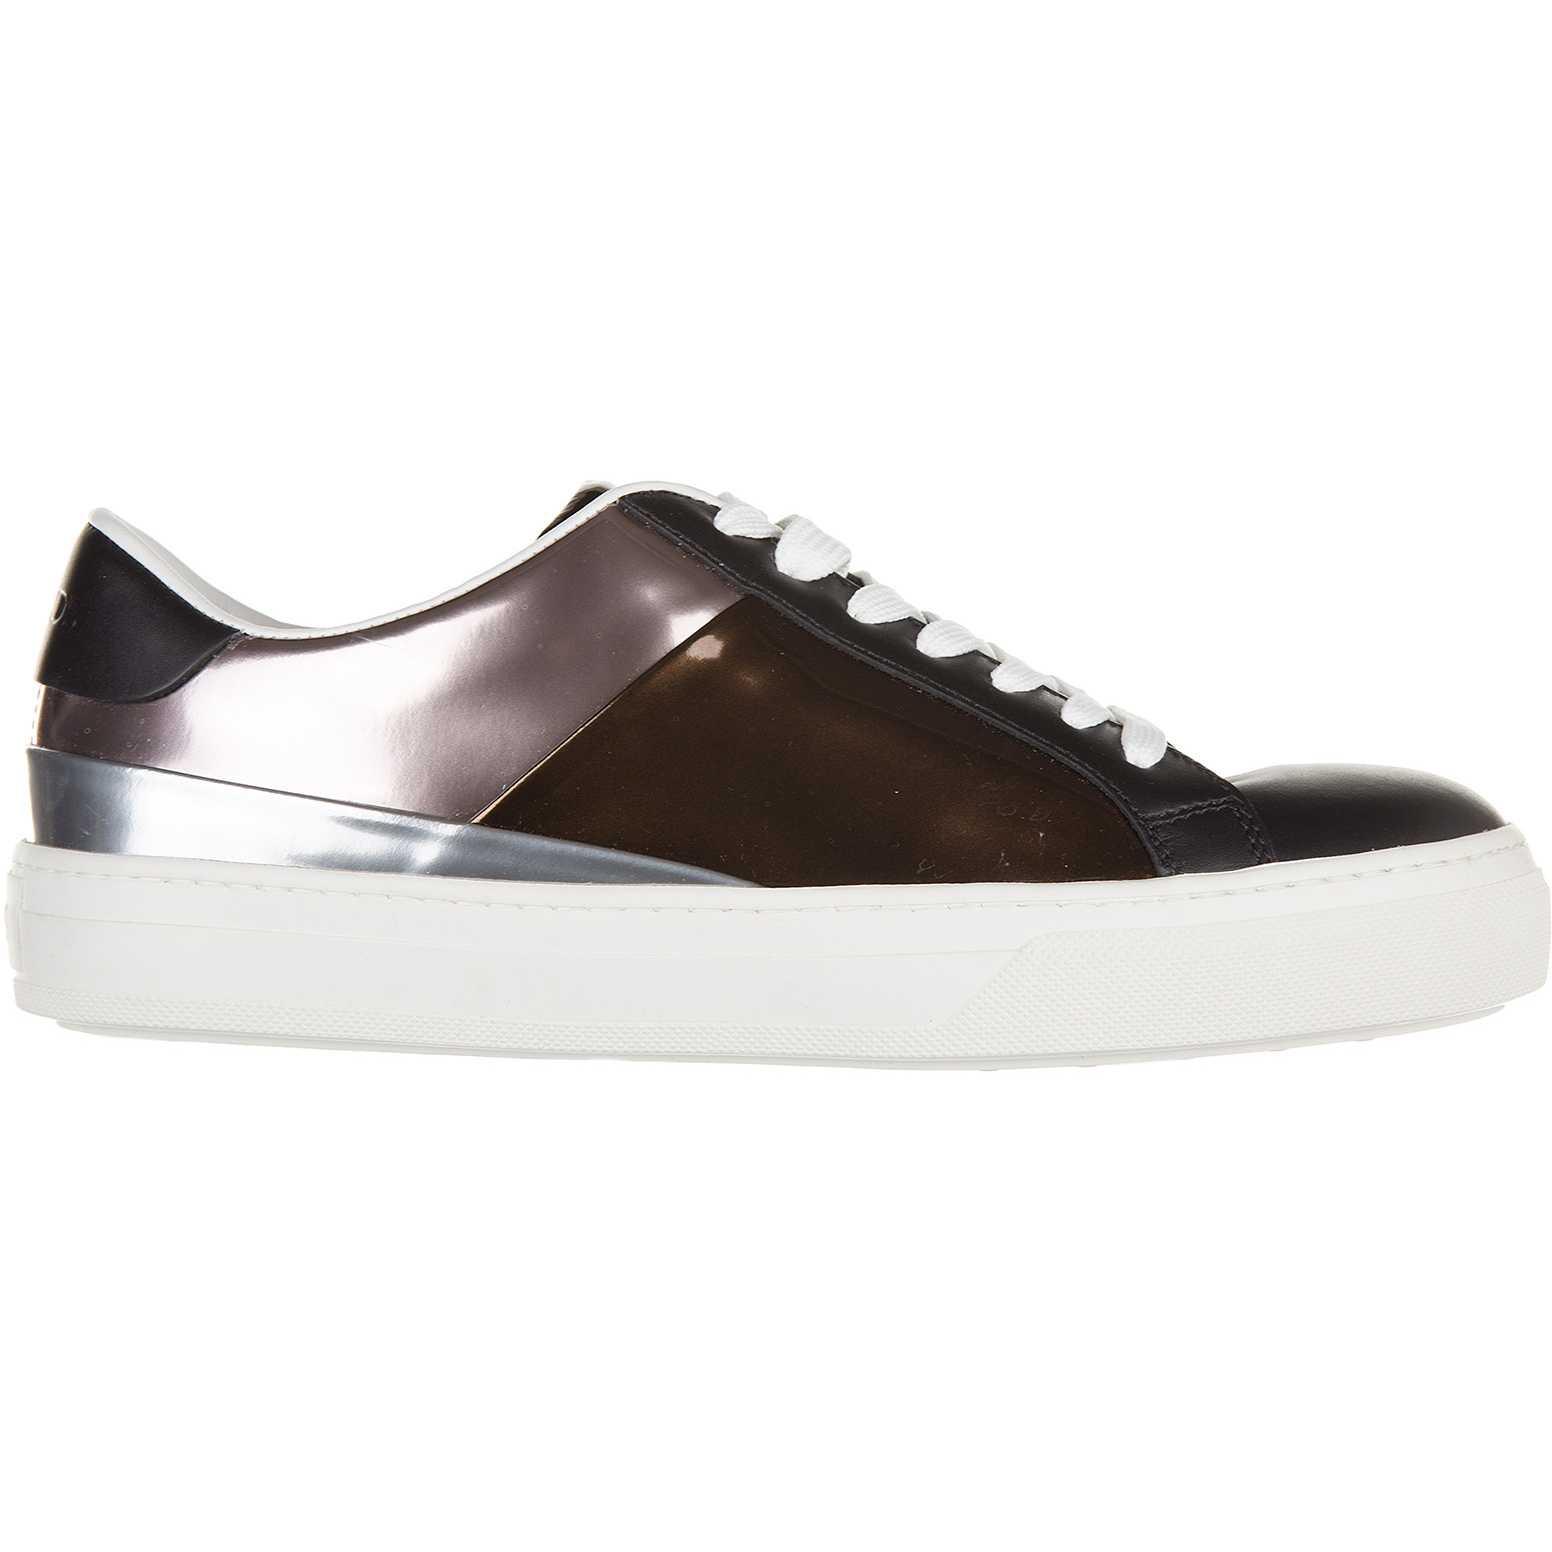 TOD'S Sneakerssportivo Allacciato Black pentru femei